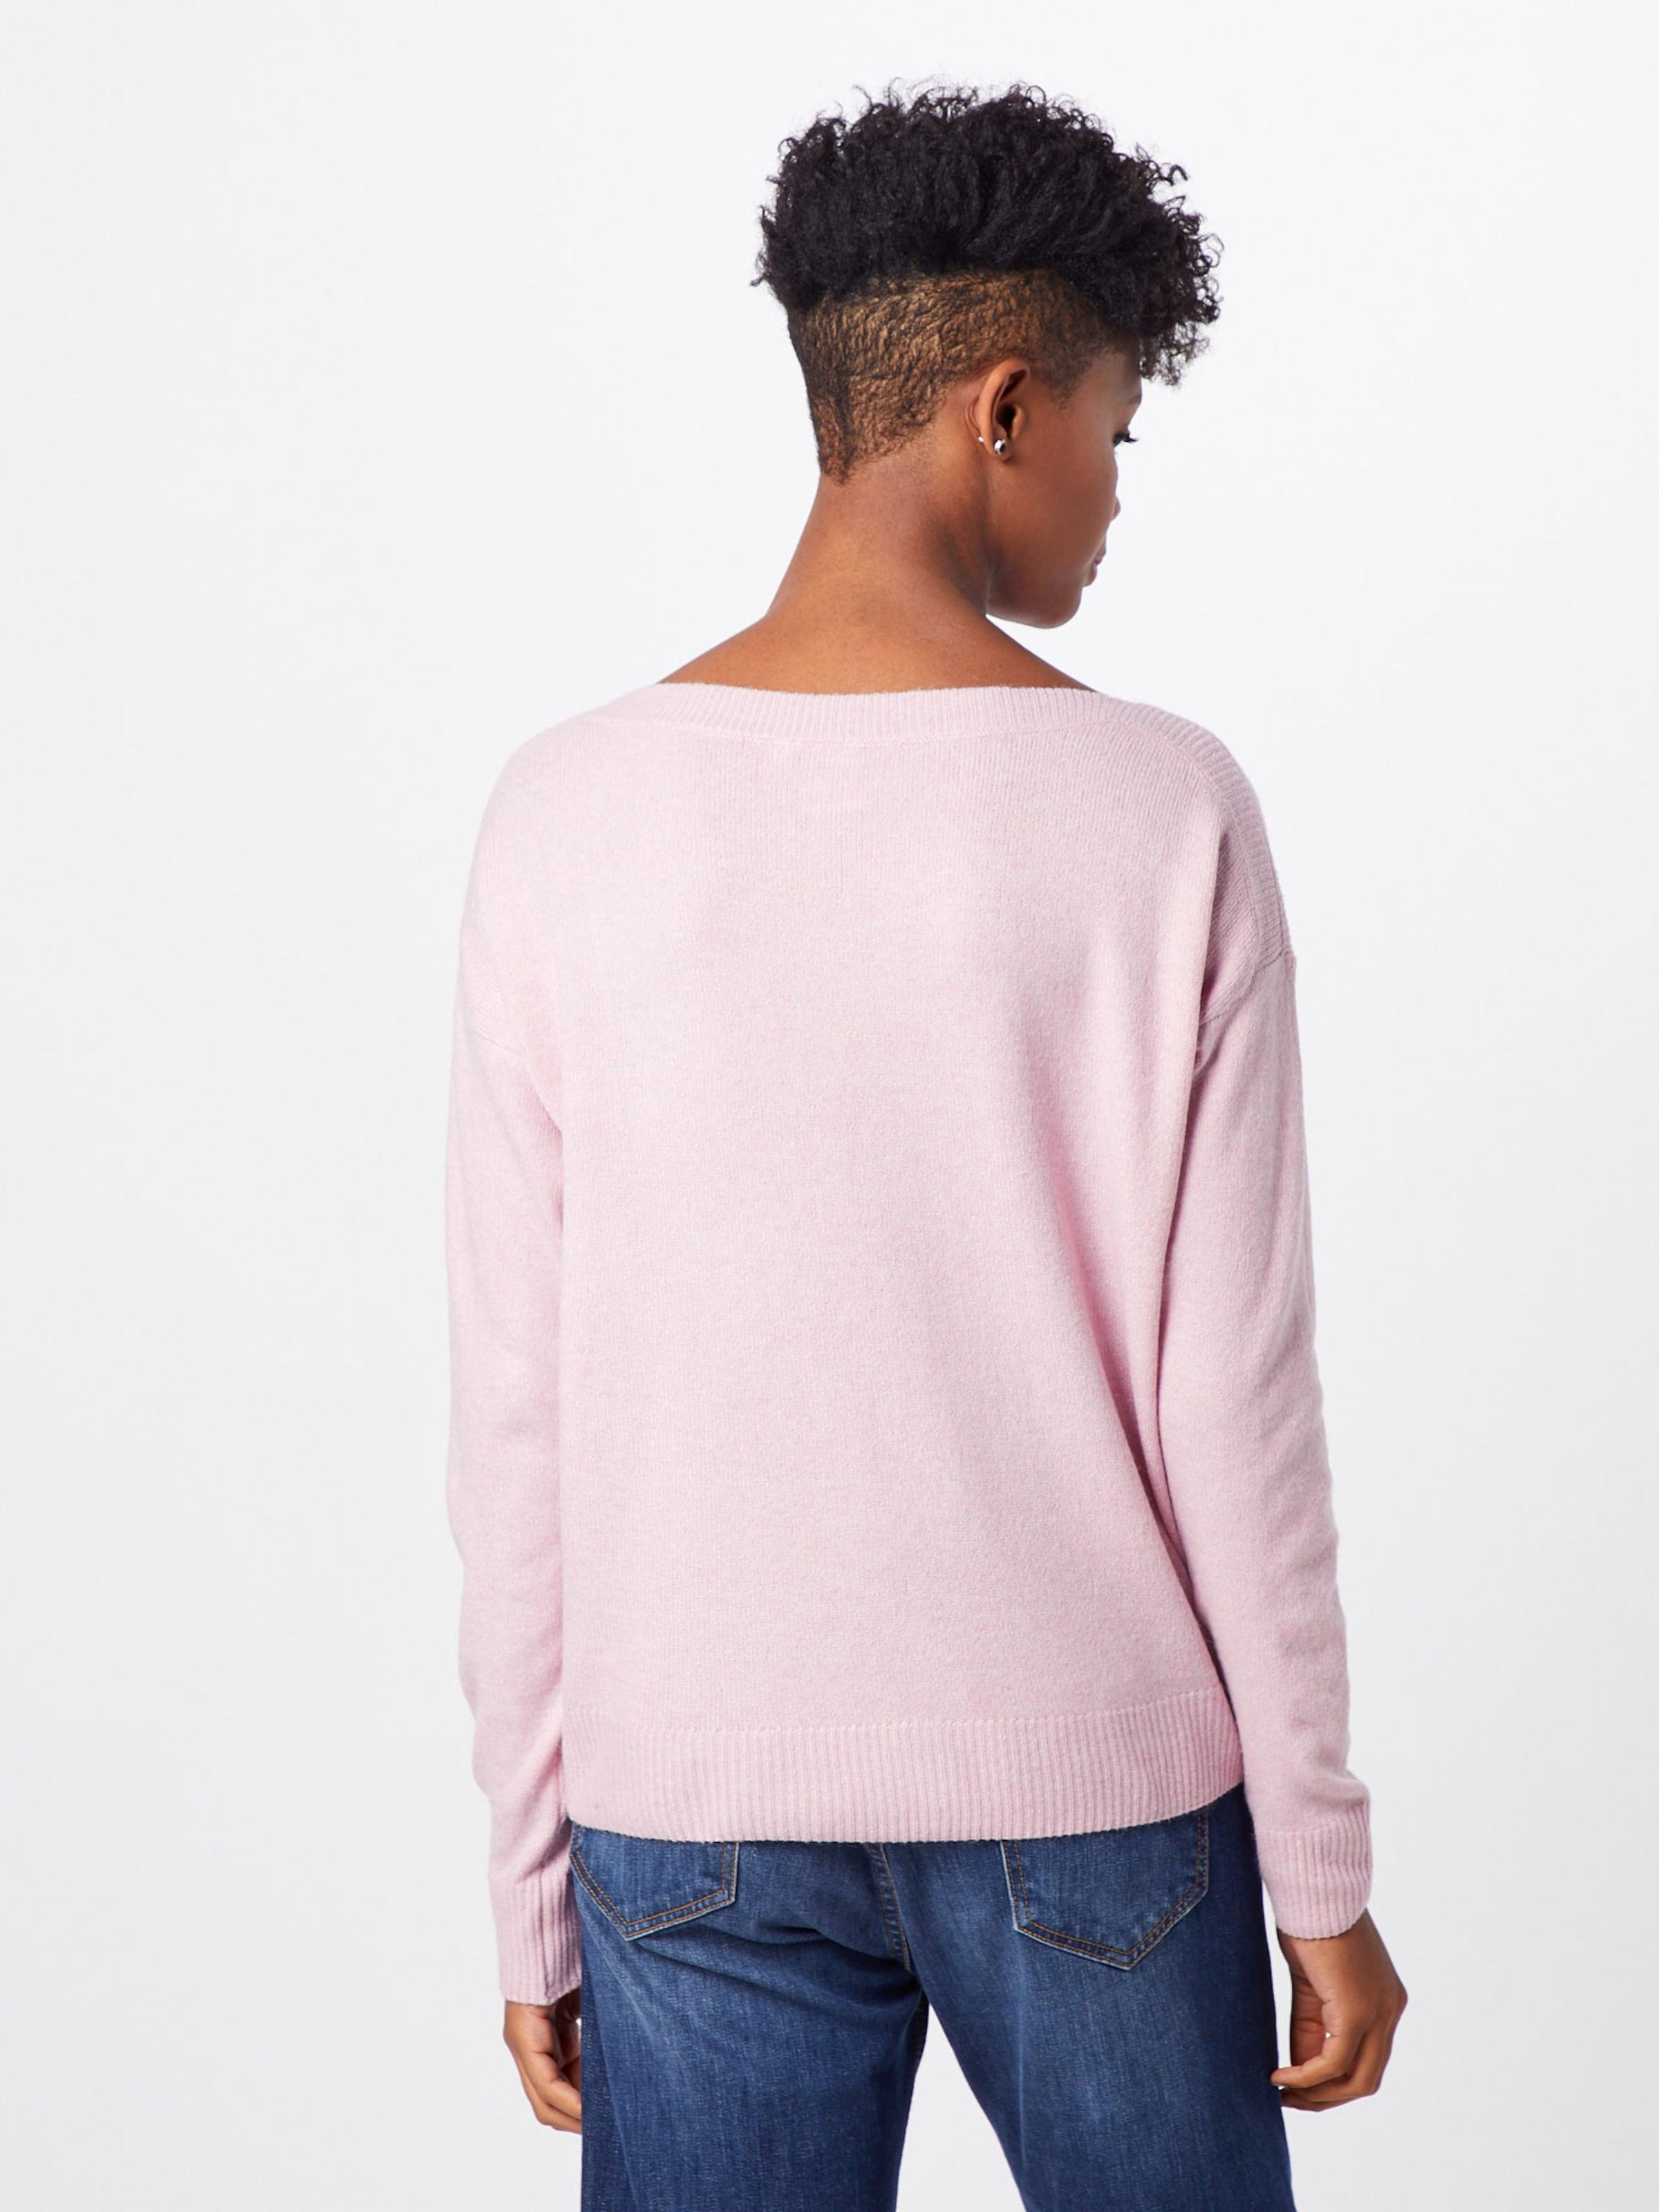 Ichi Pullover Ls2' Pink 'ihalpa In 543RjALq